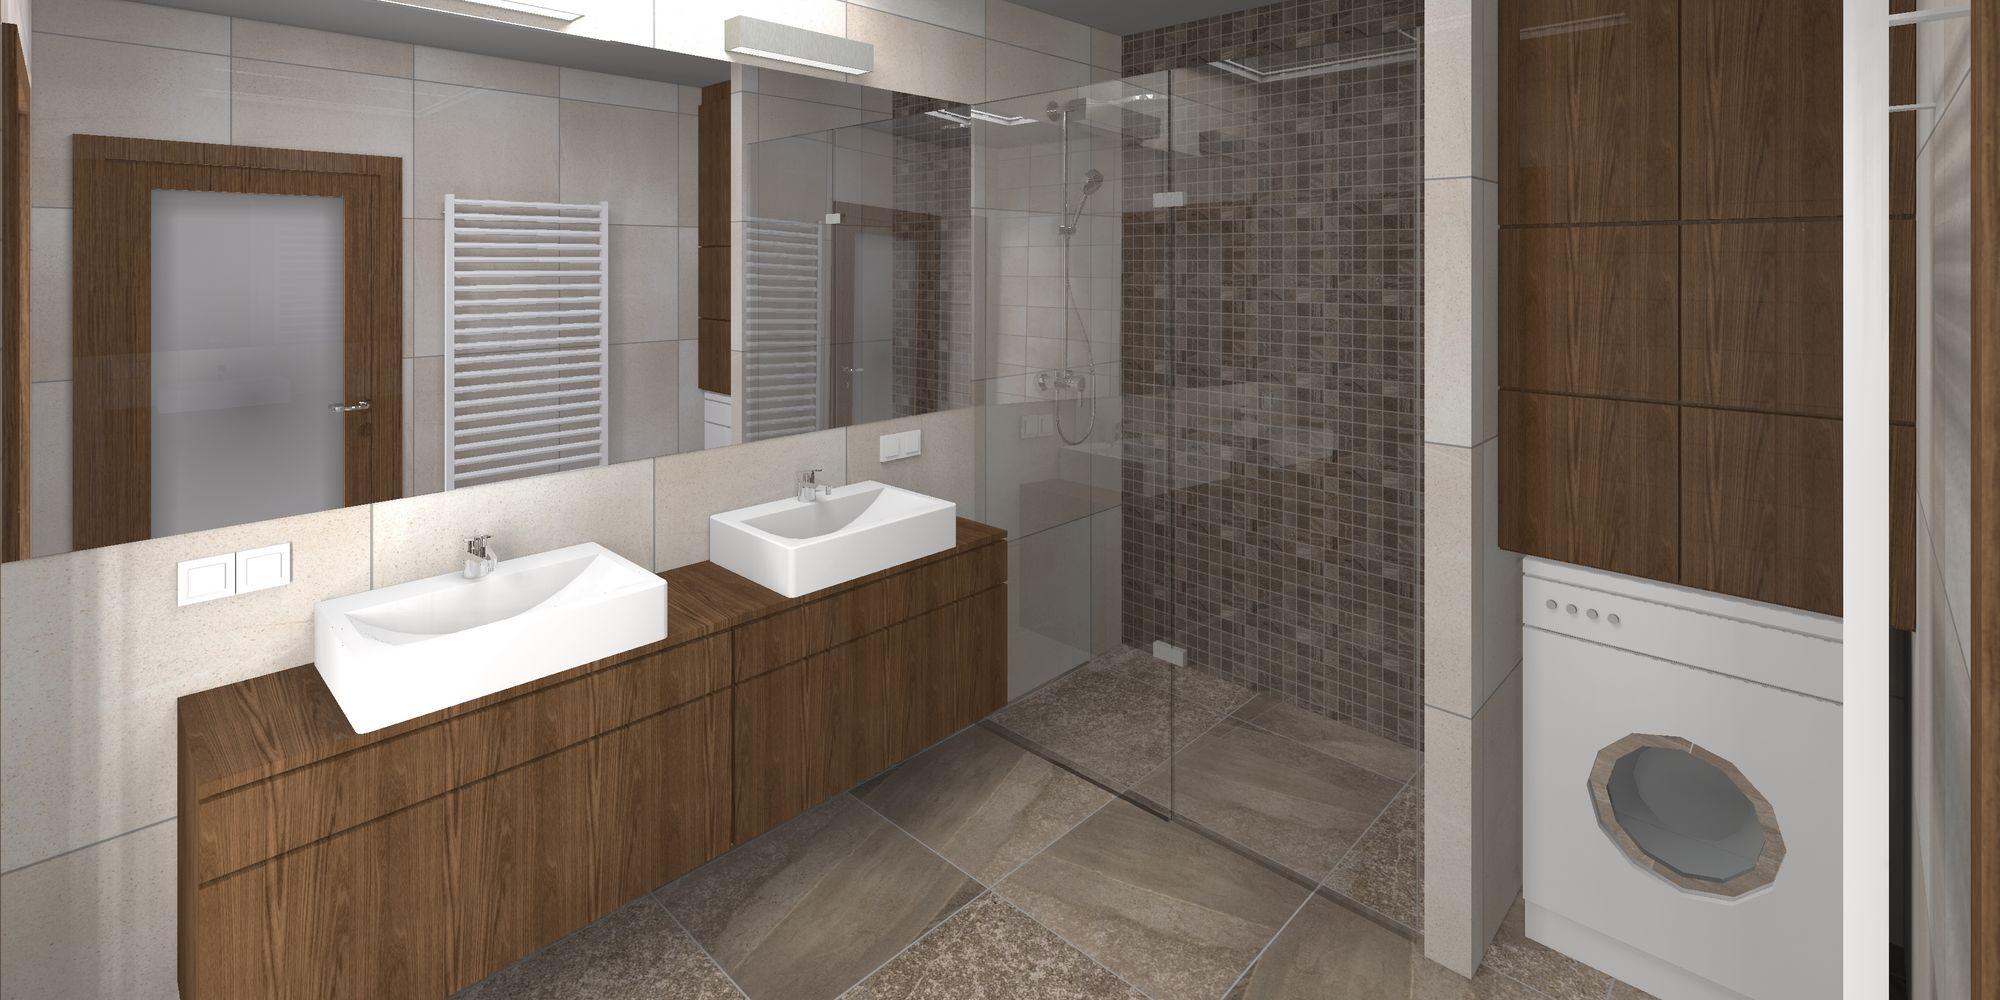 Rekonstrukce koupelny - image